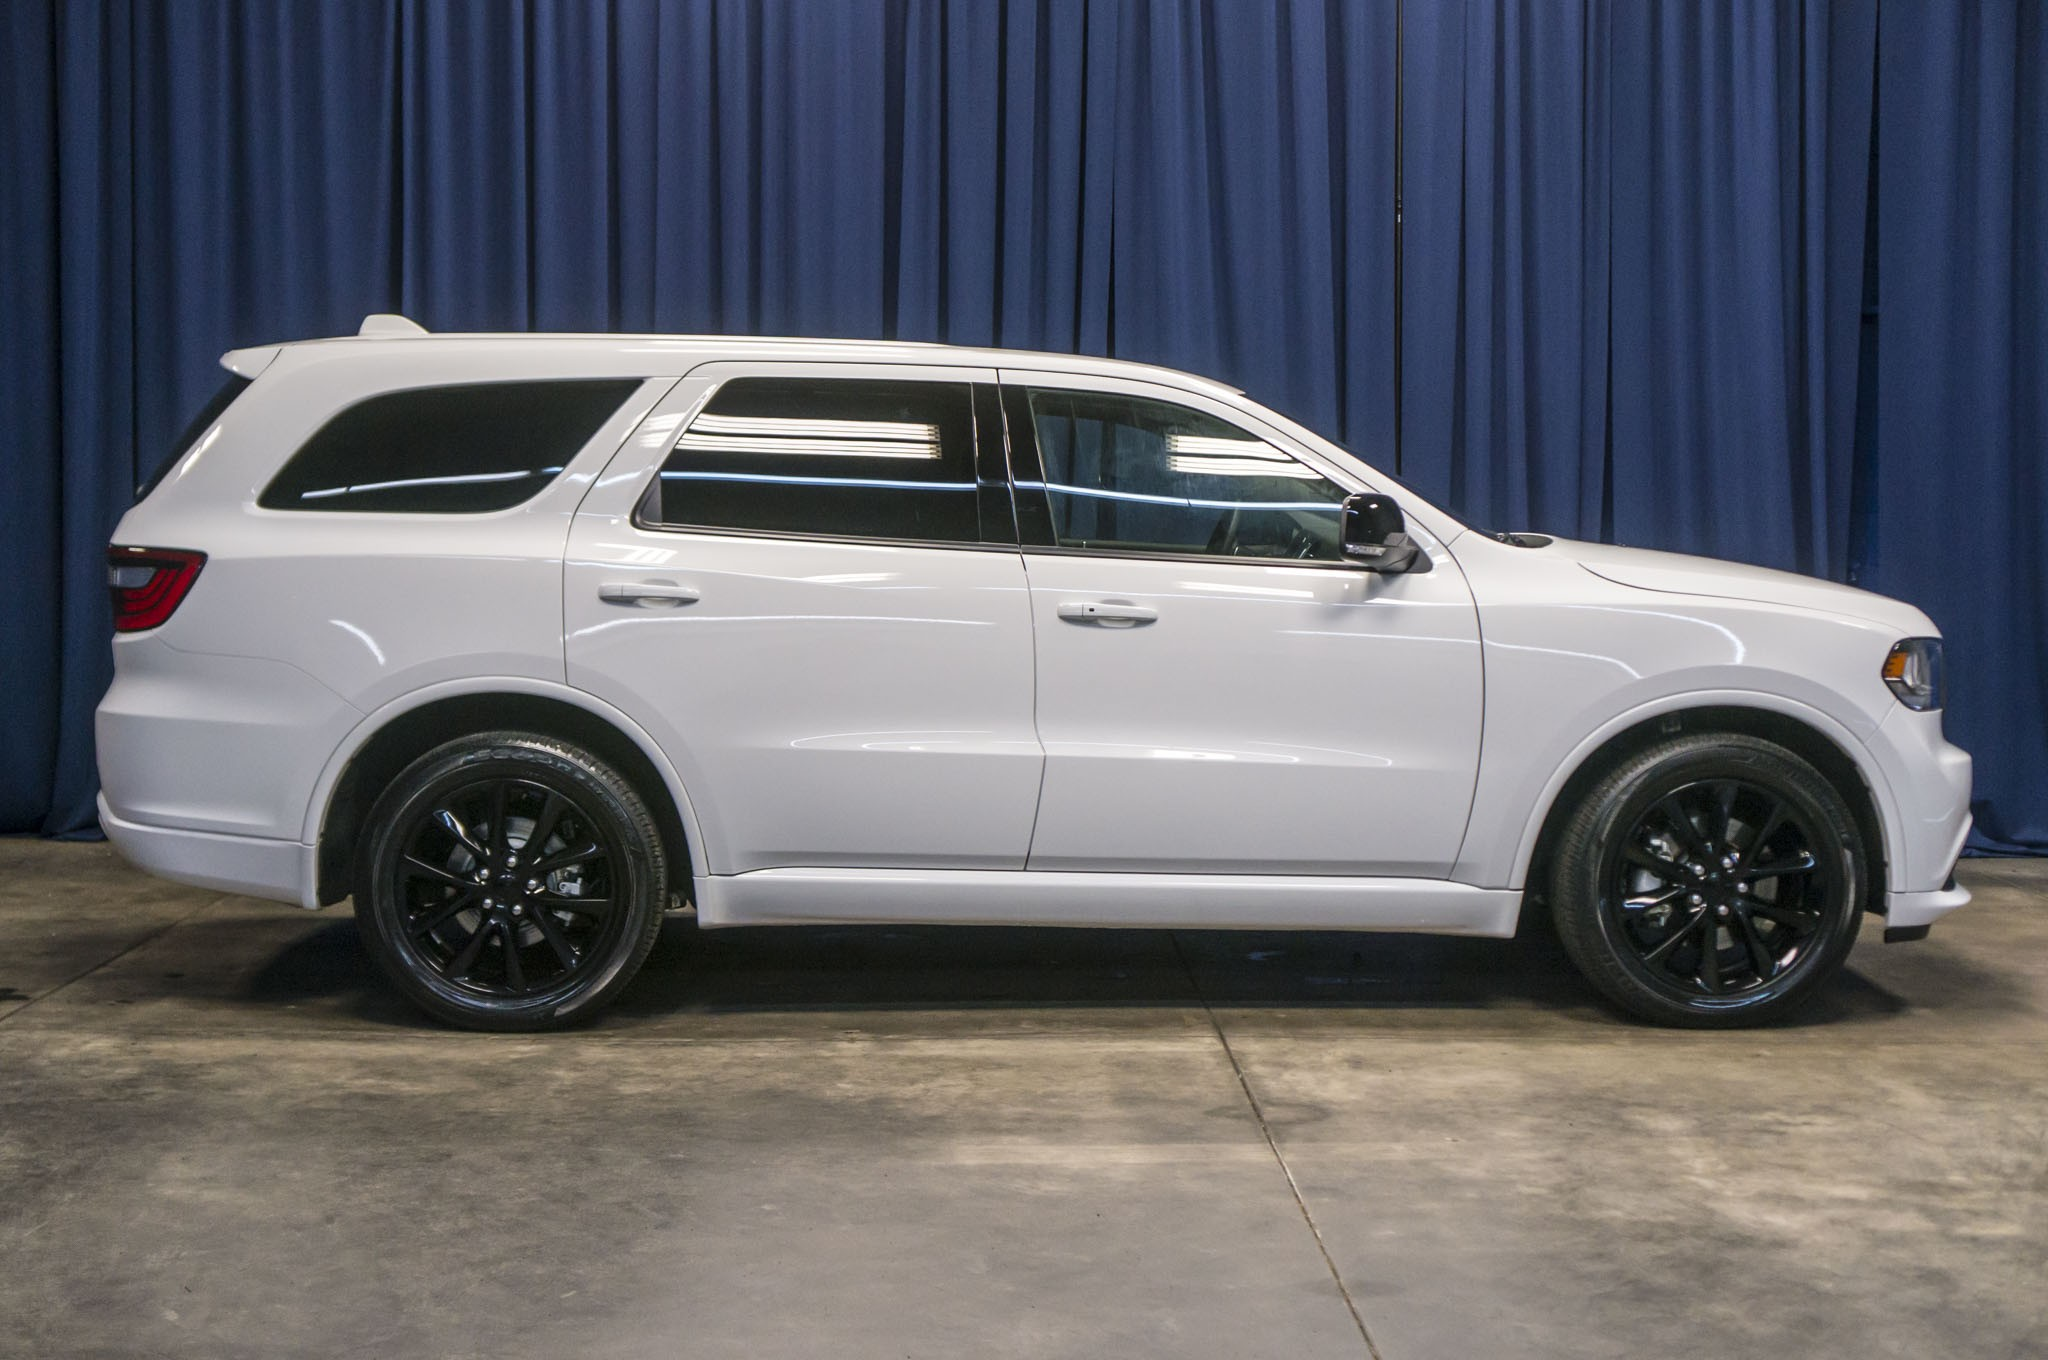 Used 2017 Dodge Durango Rt Awd Suv For Sale 39903